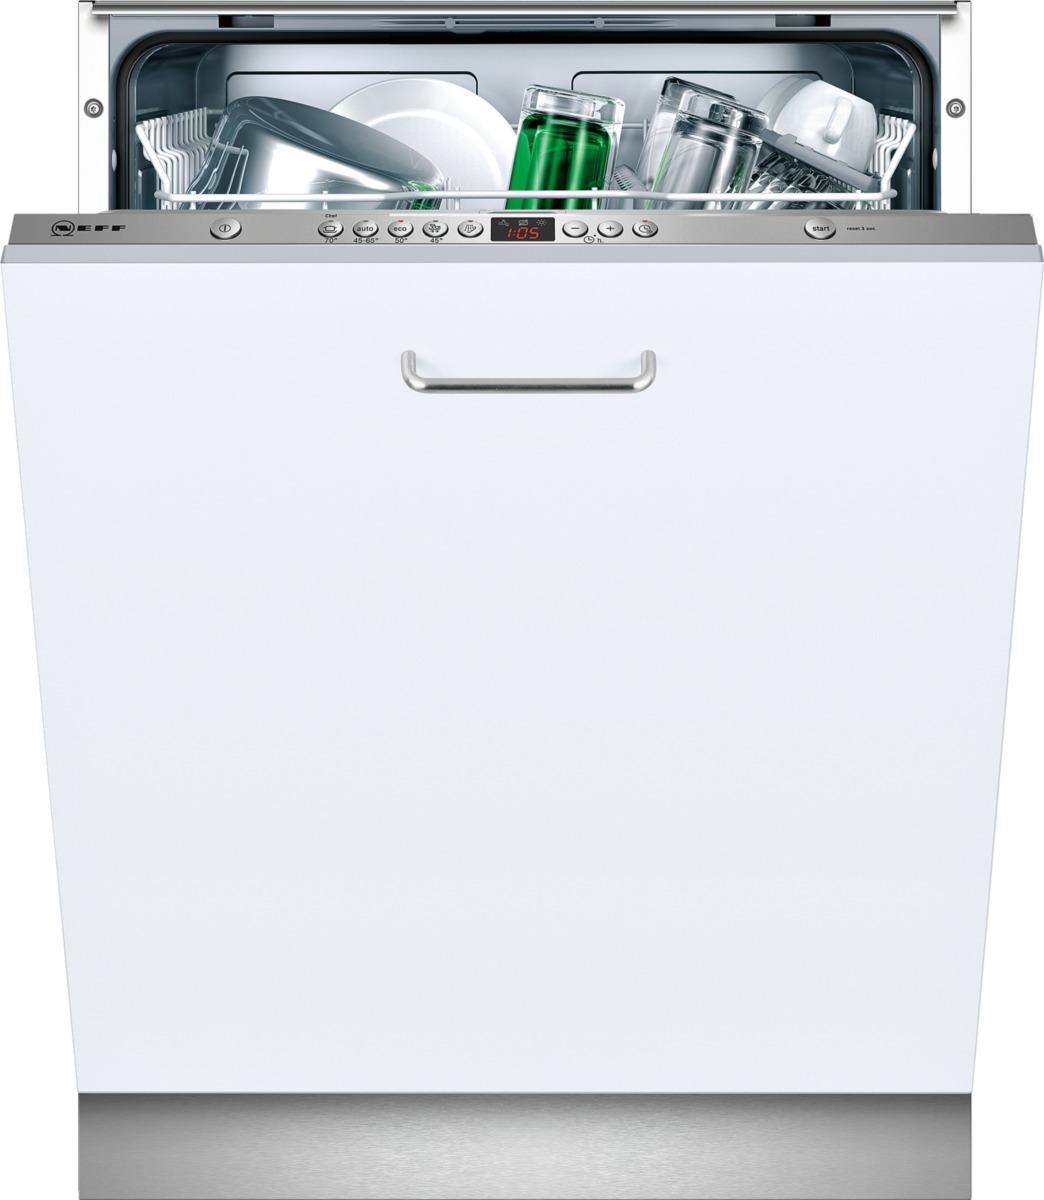 Neff Dishwasher - Herts Bathrooms - Herts Bathrooms